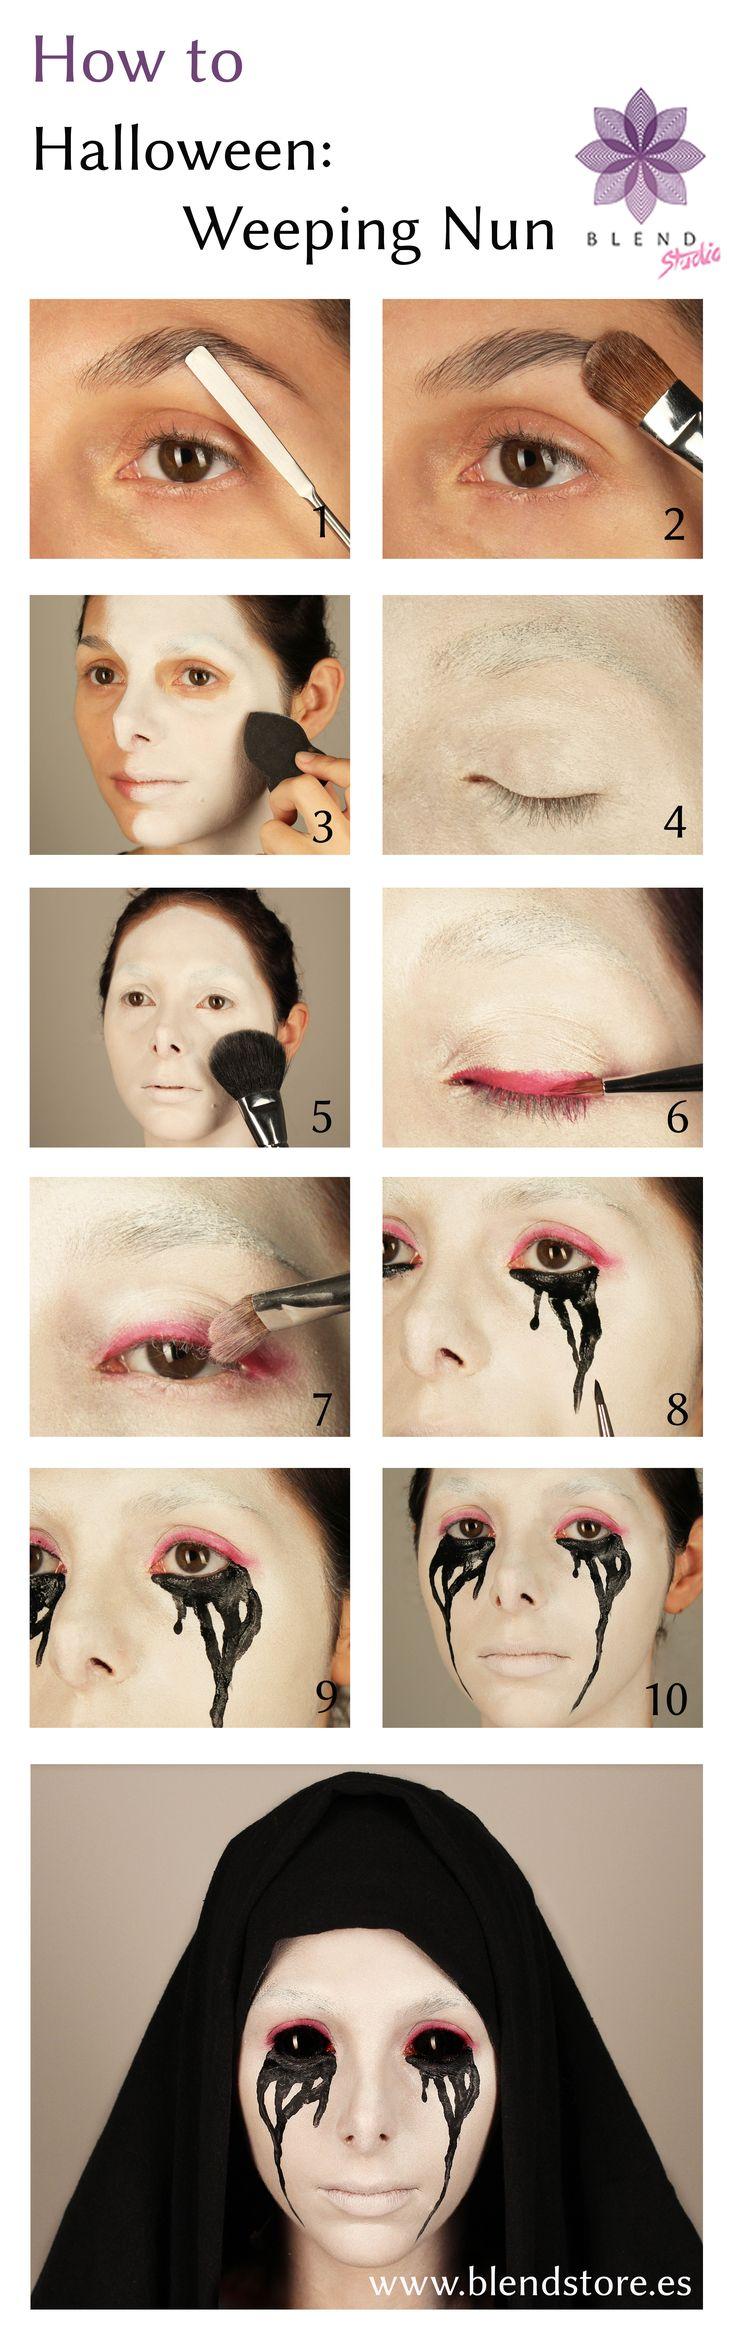 American Horror Story inspired Halloween Weeping Nun Makeup Tutorial from Blend Store & Studio